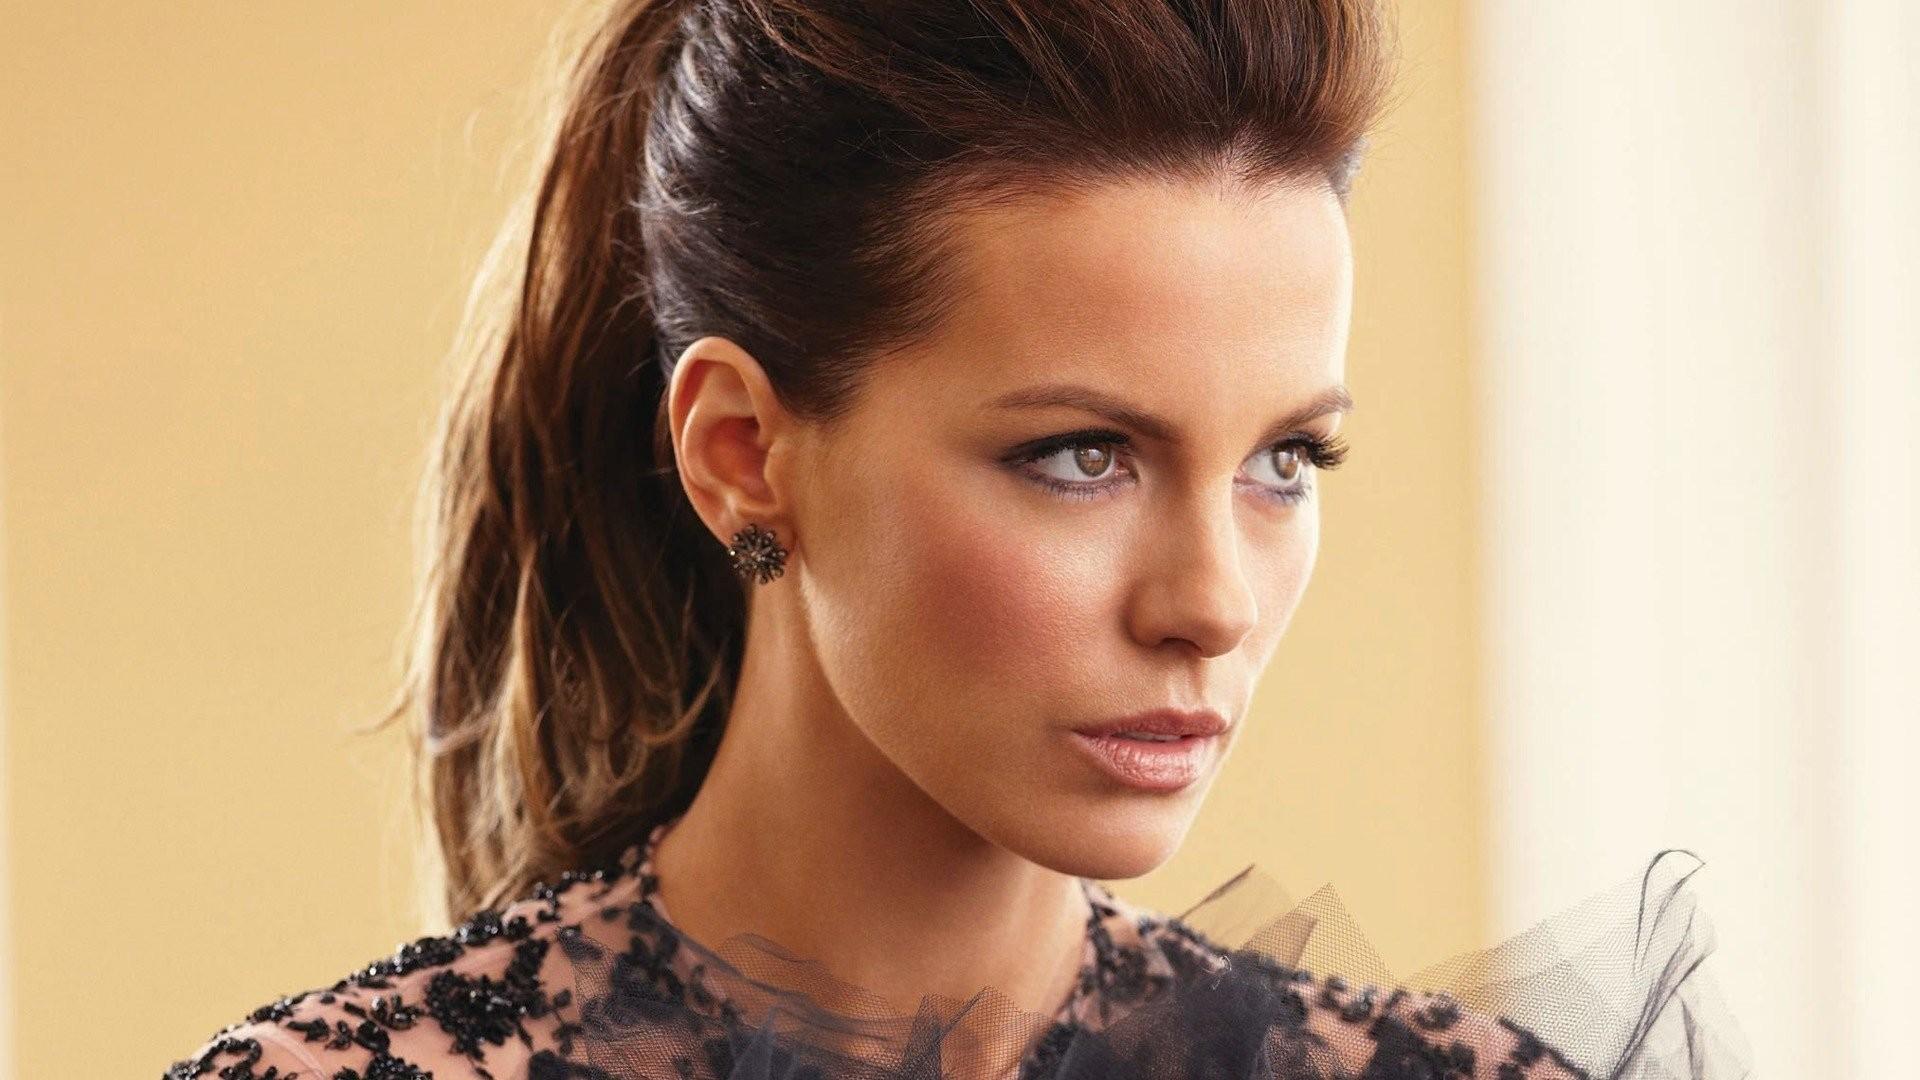 Kate Beckinsale Wallpaper Pic